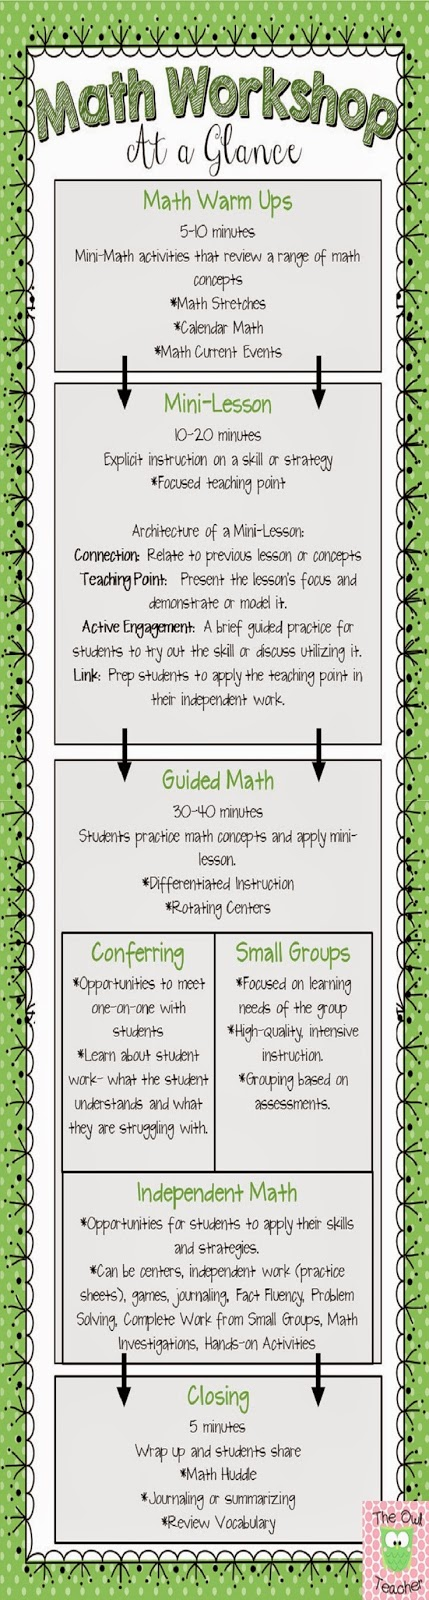 Math Workshop in Action - The Owl Teacher